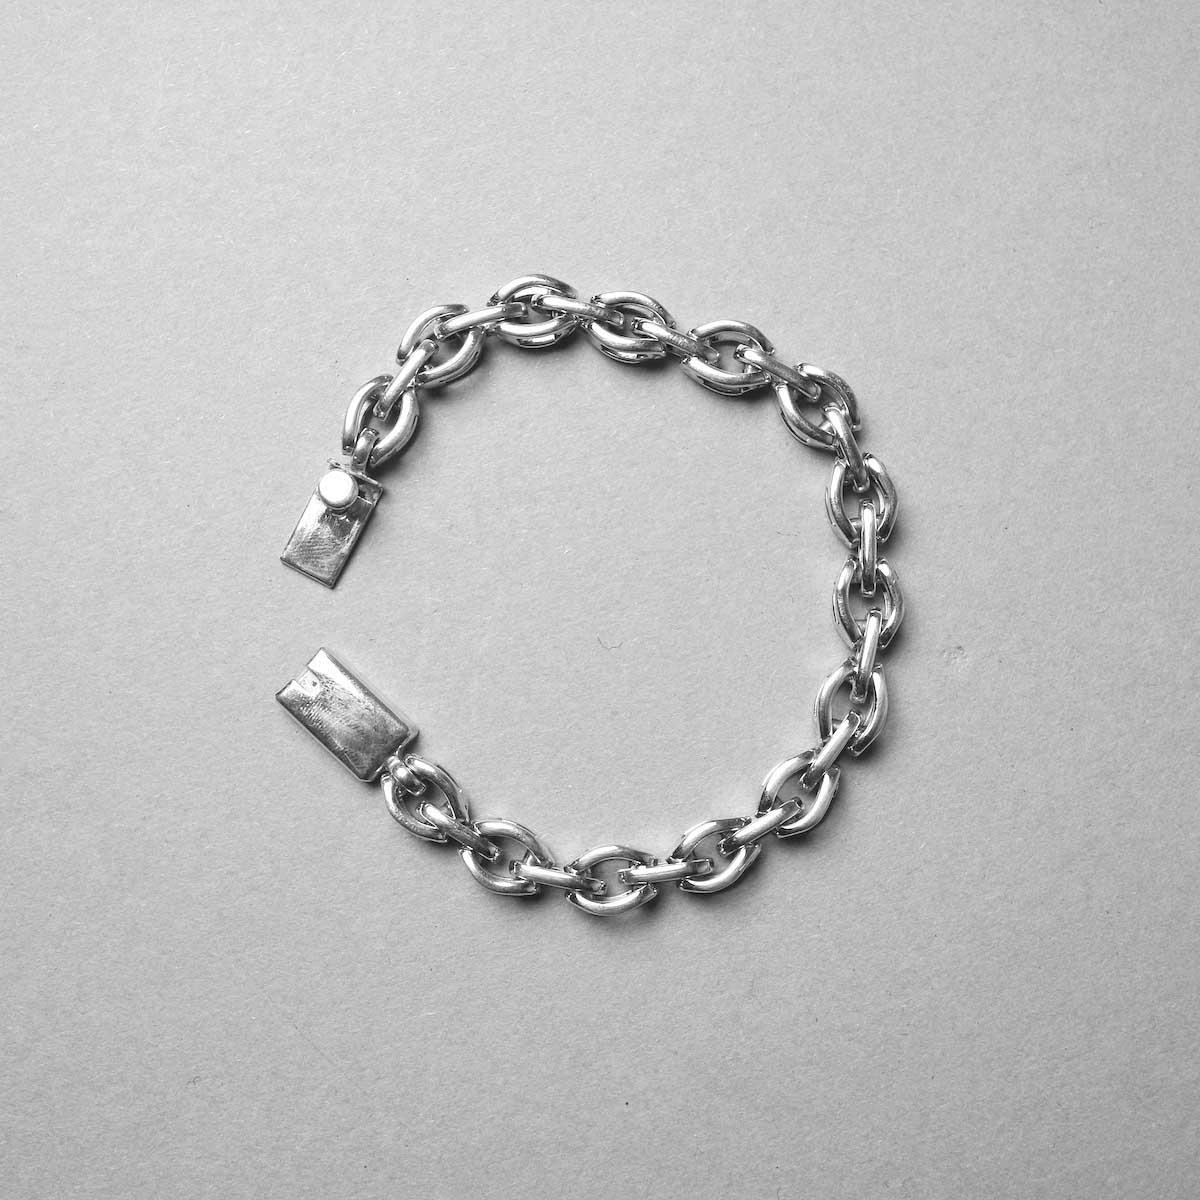 FIFTH SILVER /  Silver Bracelet CCC-2 (7mm)